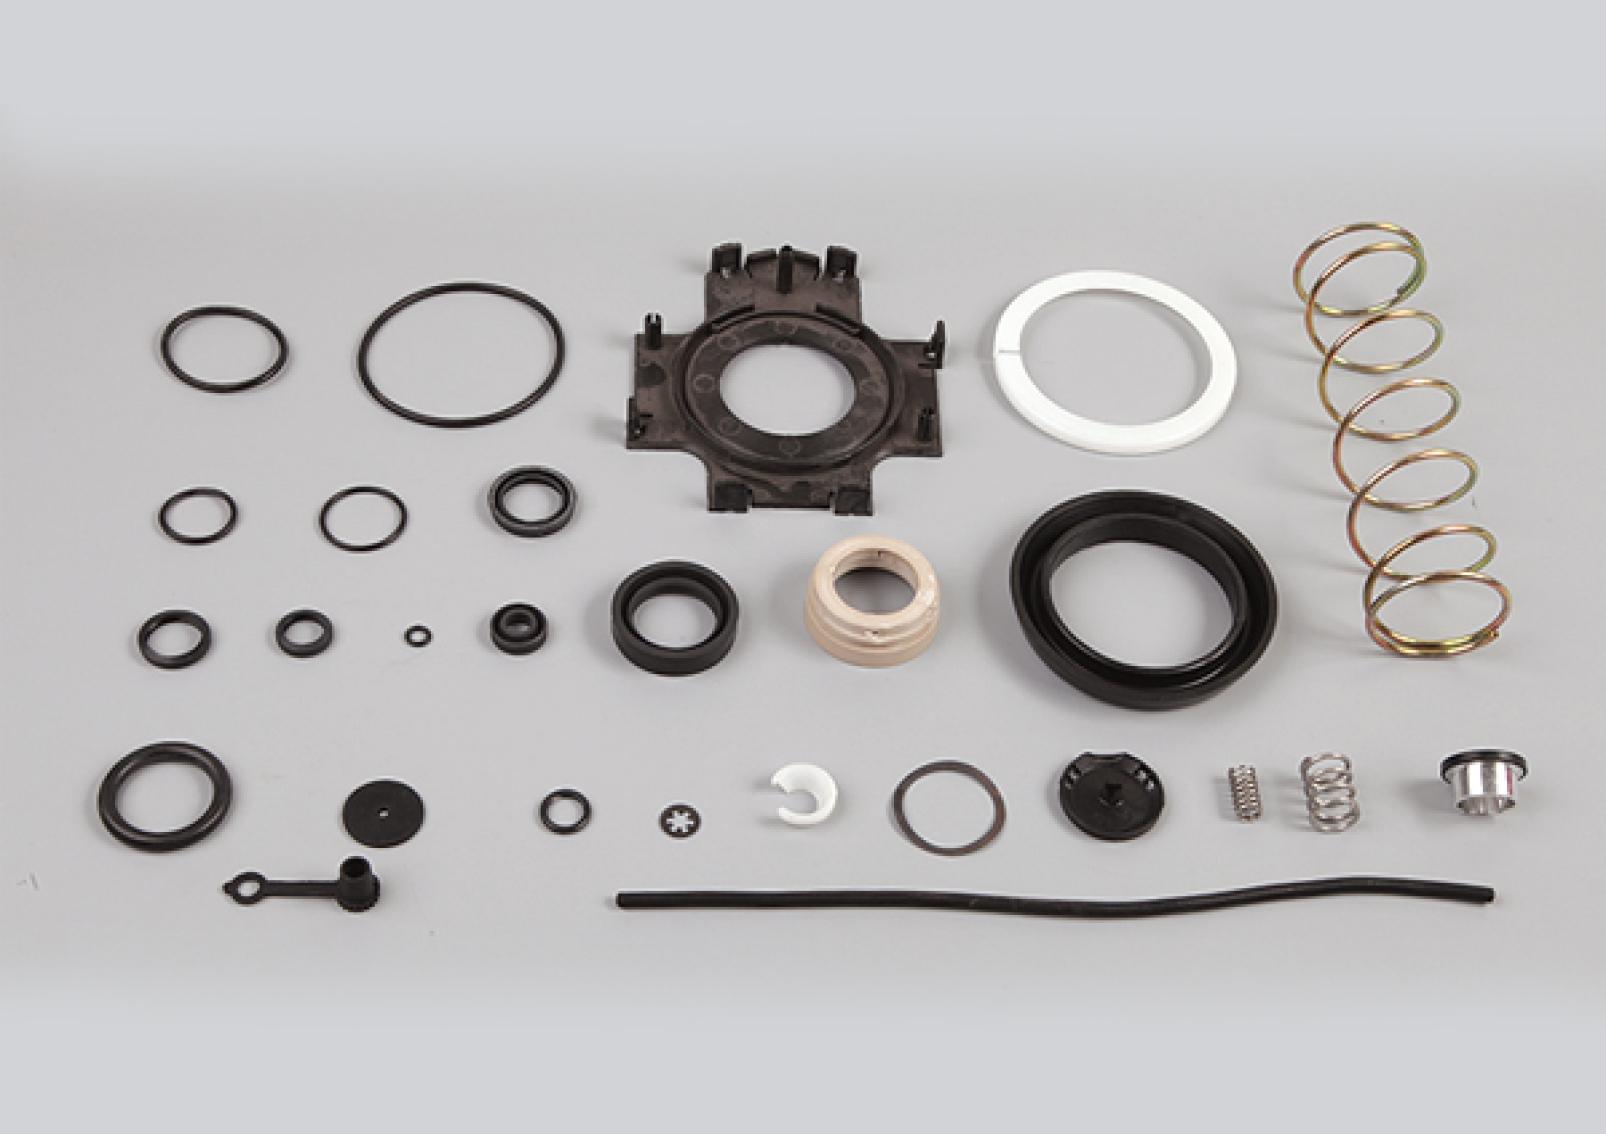 Clutch Servo Repair Kit for Man, Daf, 970 051 952 2, 1506471, 81.30725.6082